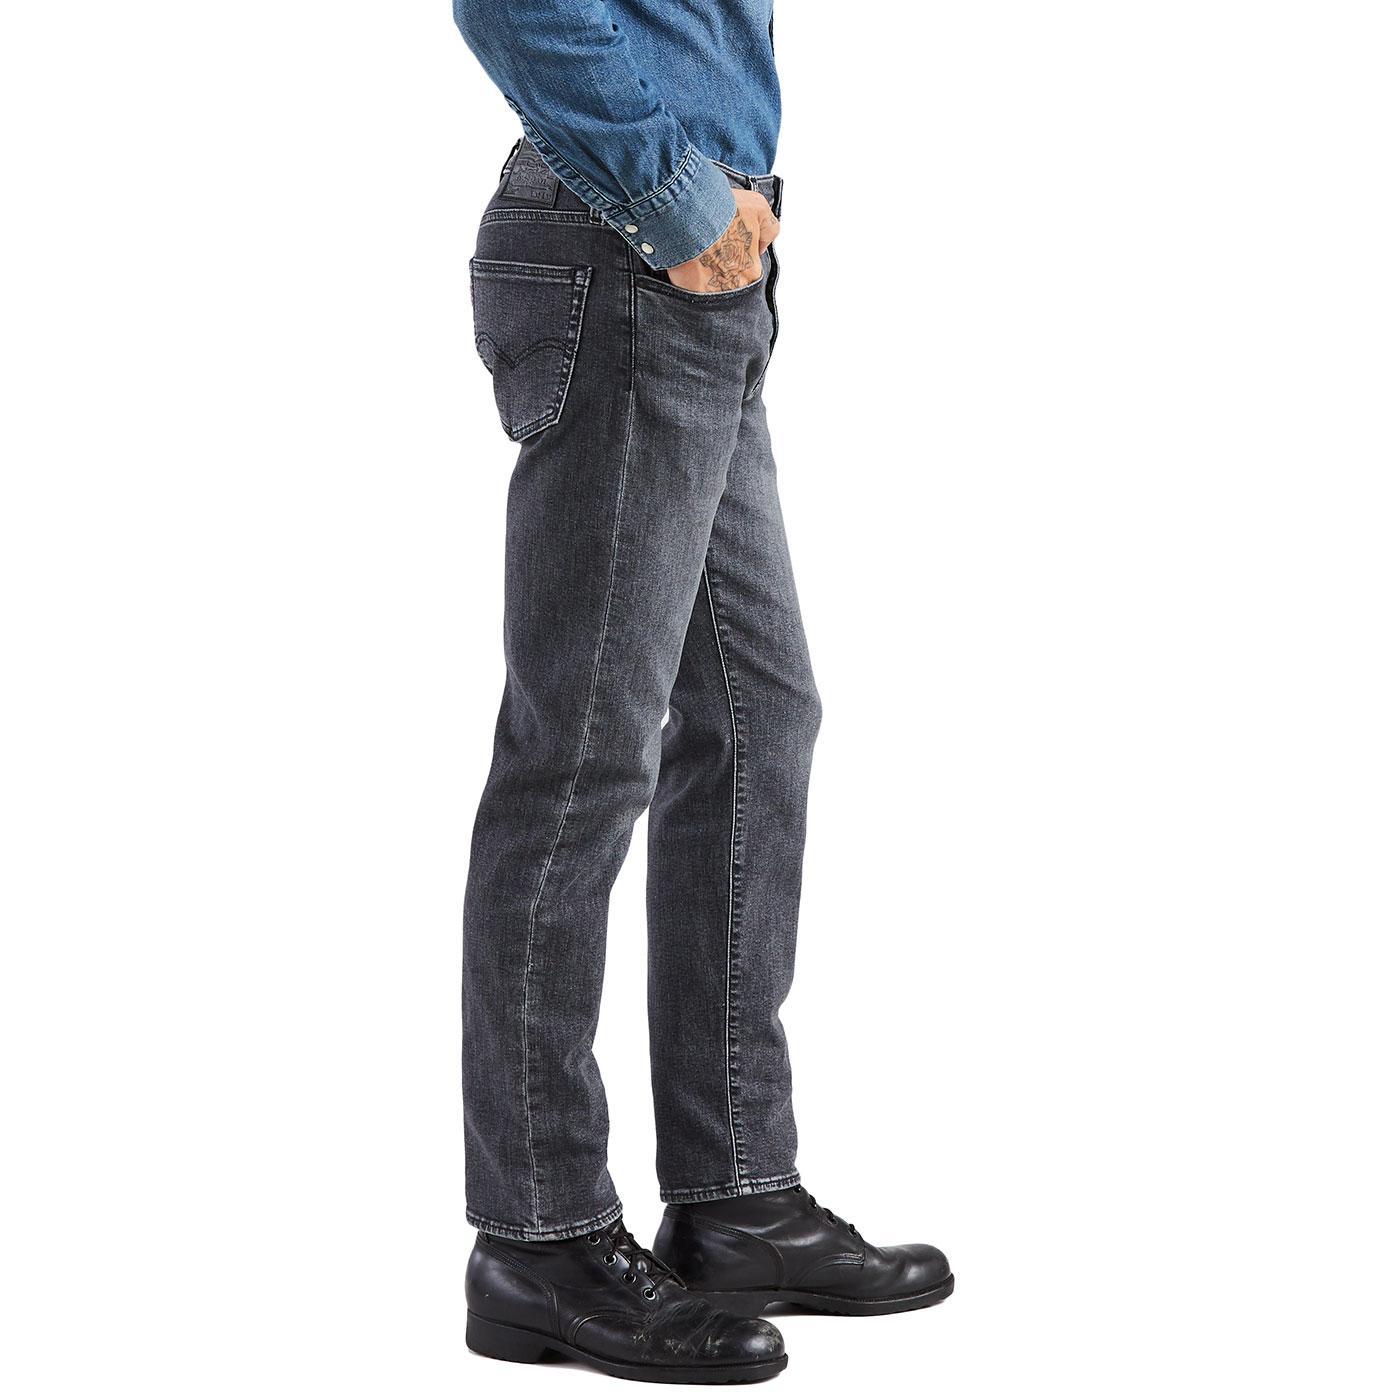 51f9ee41fd1 LEVI'S 502 Regular Taper Stretch Denim Jeans Gobbler Adv